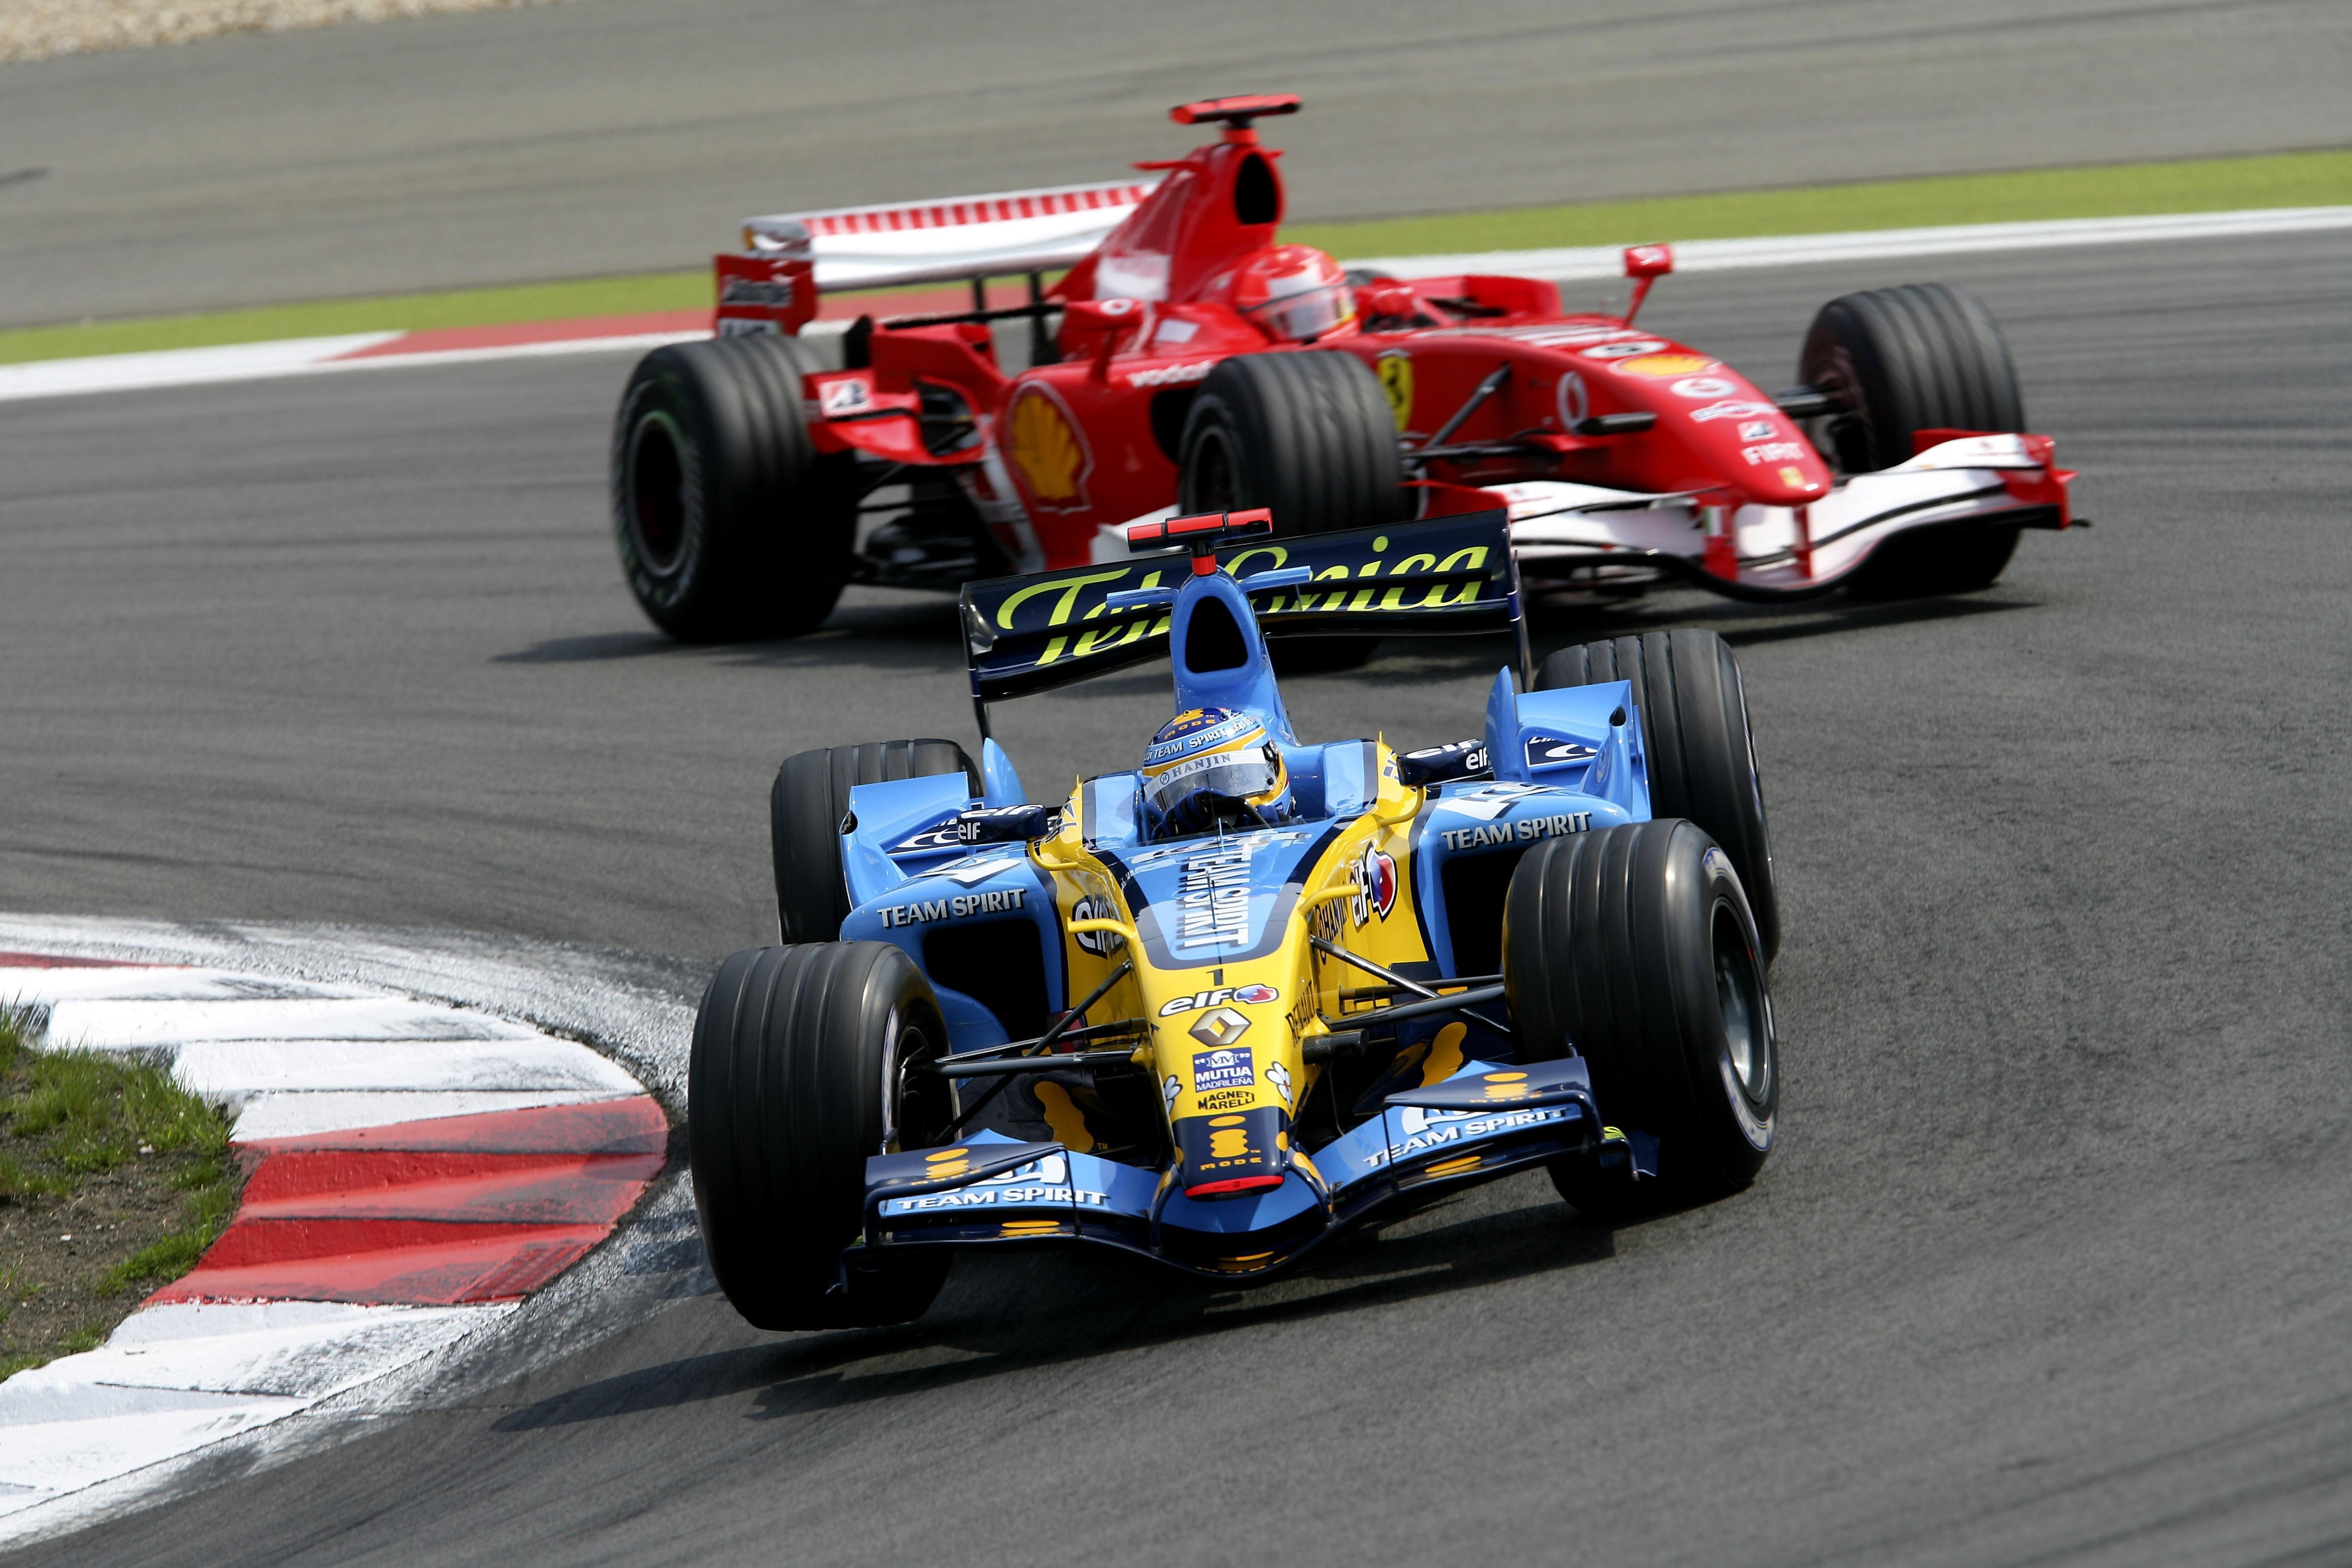 Fernando Alonso, Michael Schumacher en el GP de Europa 2006